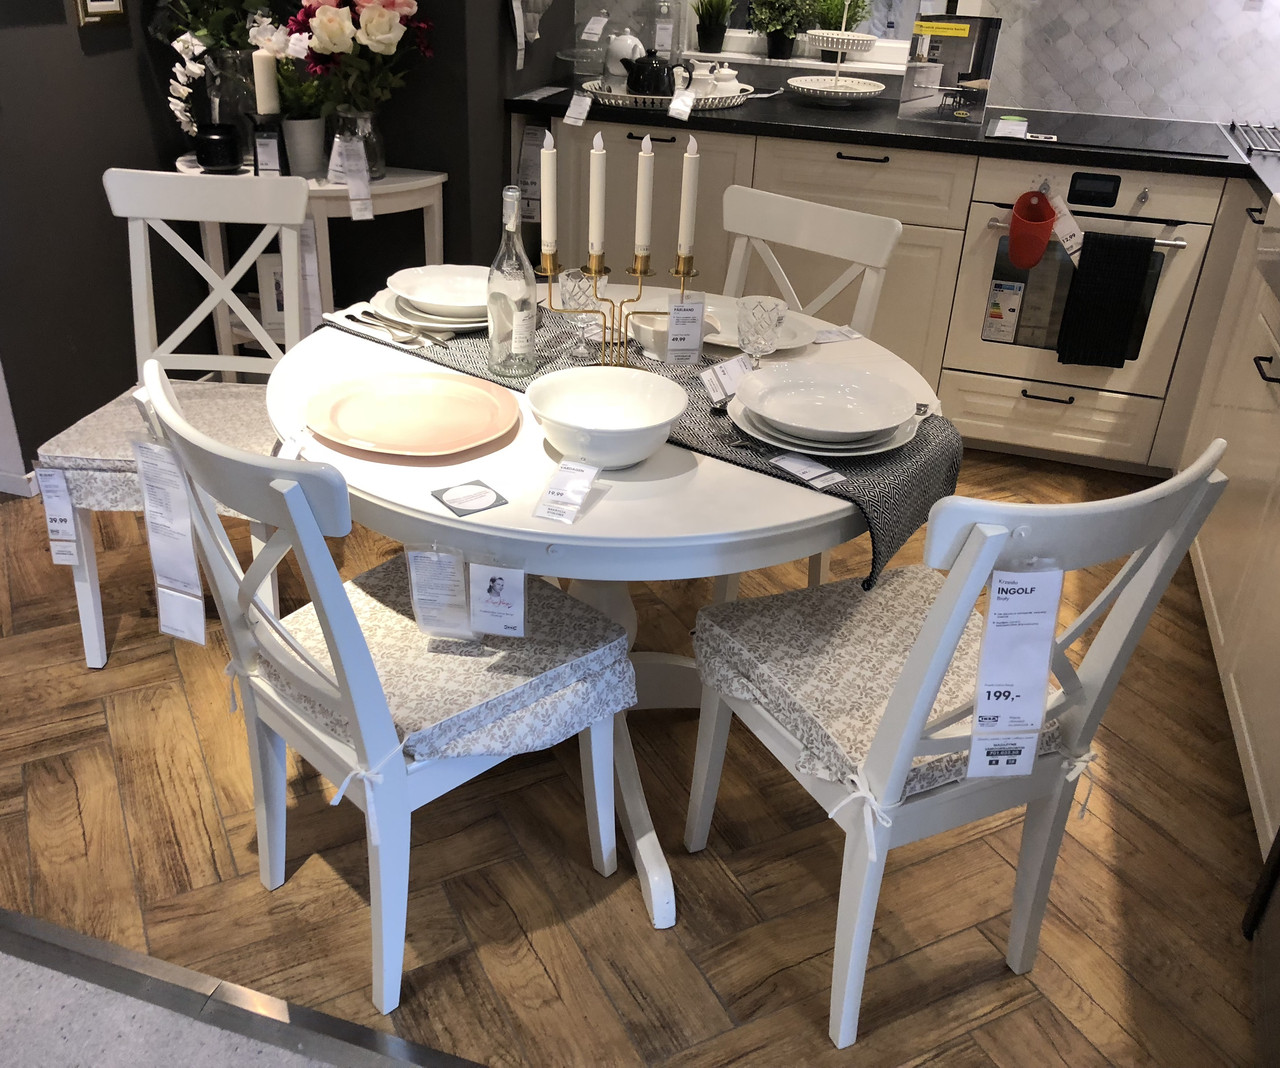 набор мебели круглый стол 4 стулья икеа Ikea цена 17 936 грн